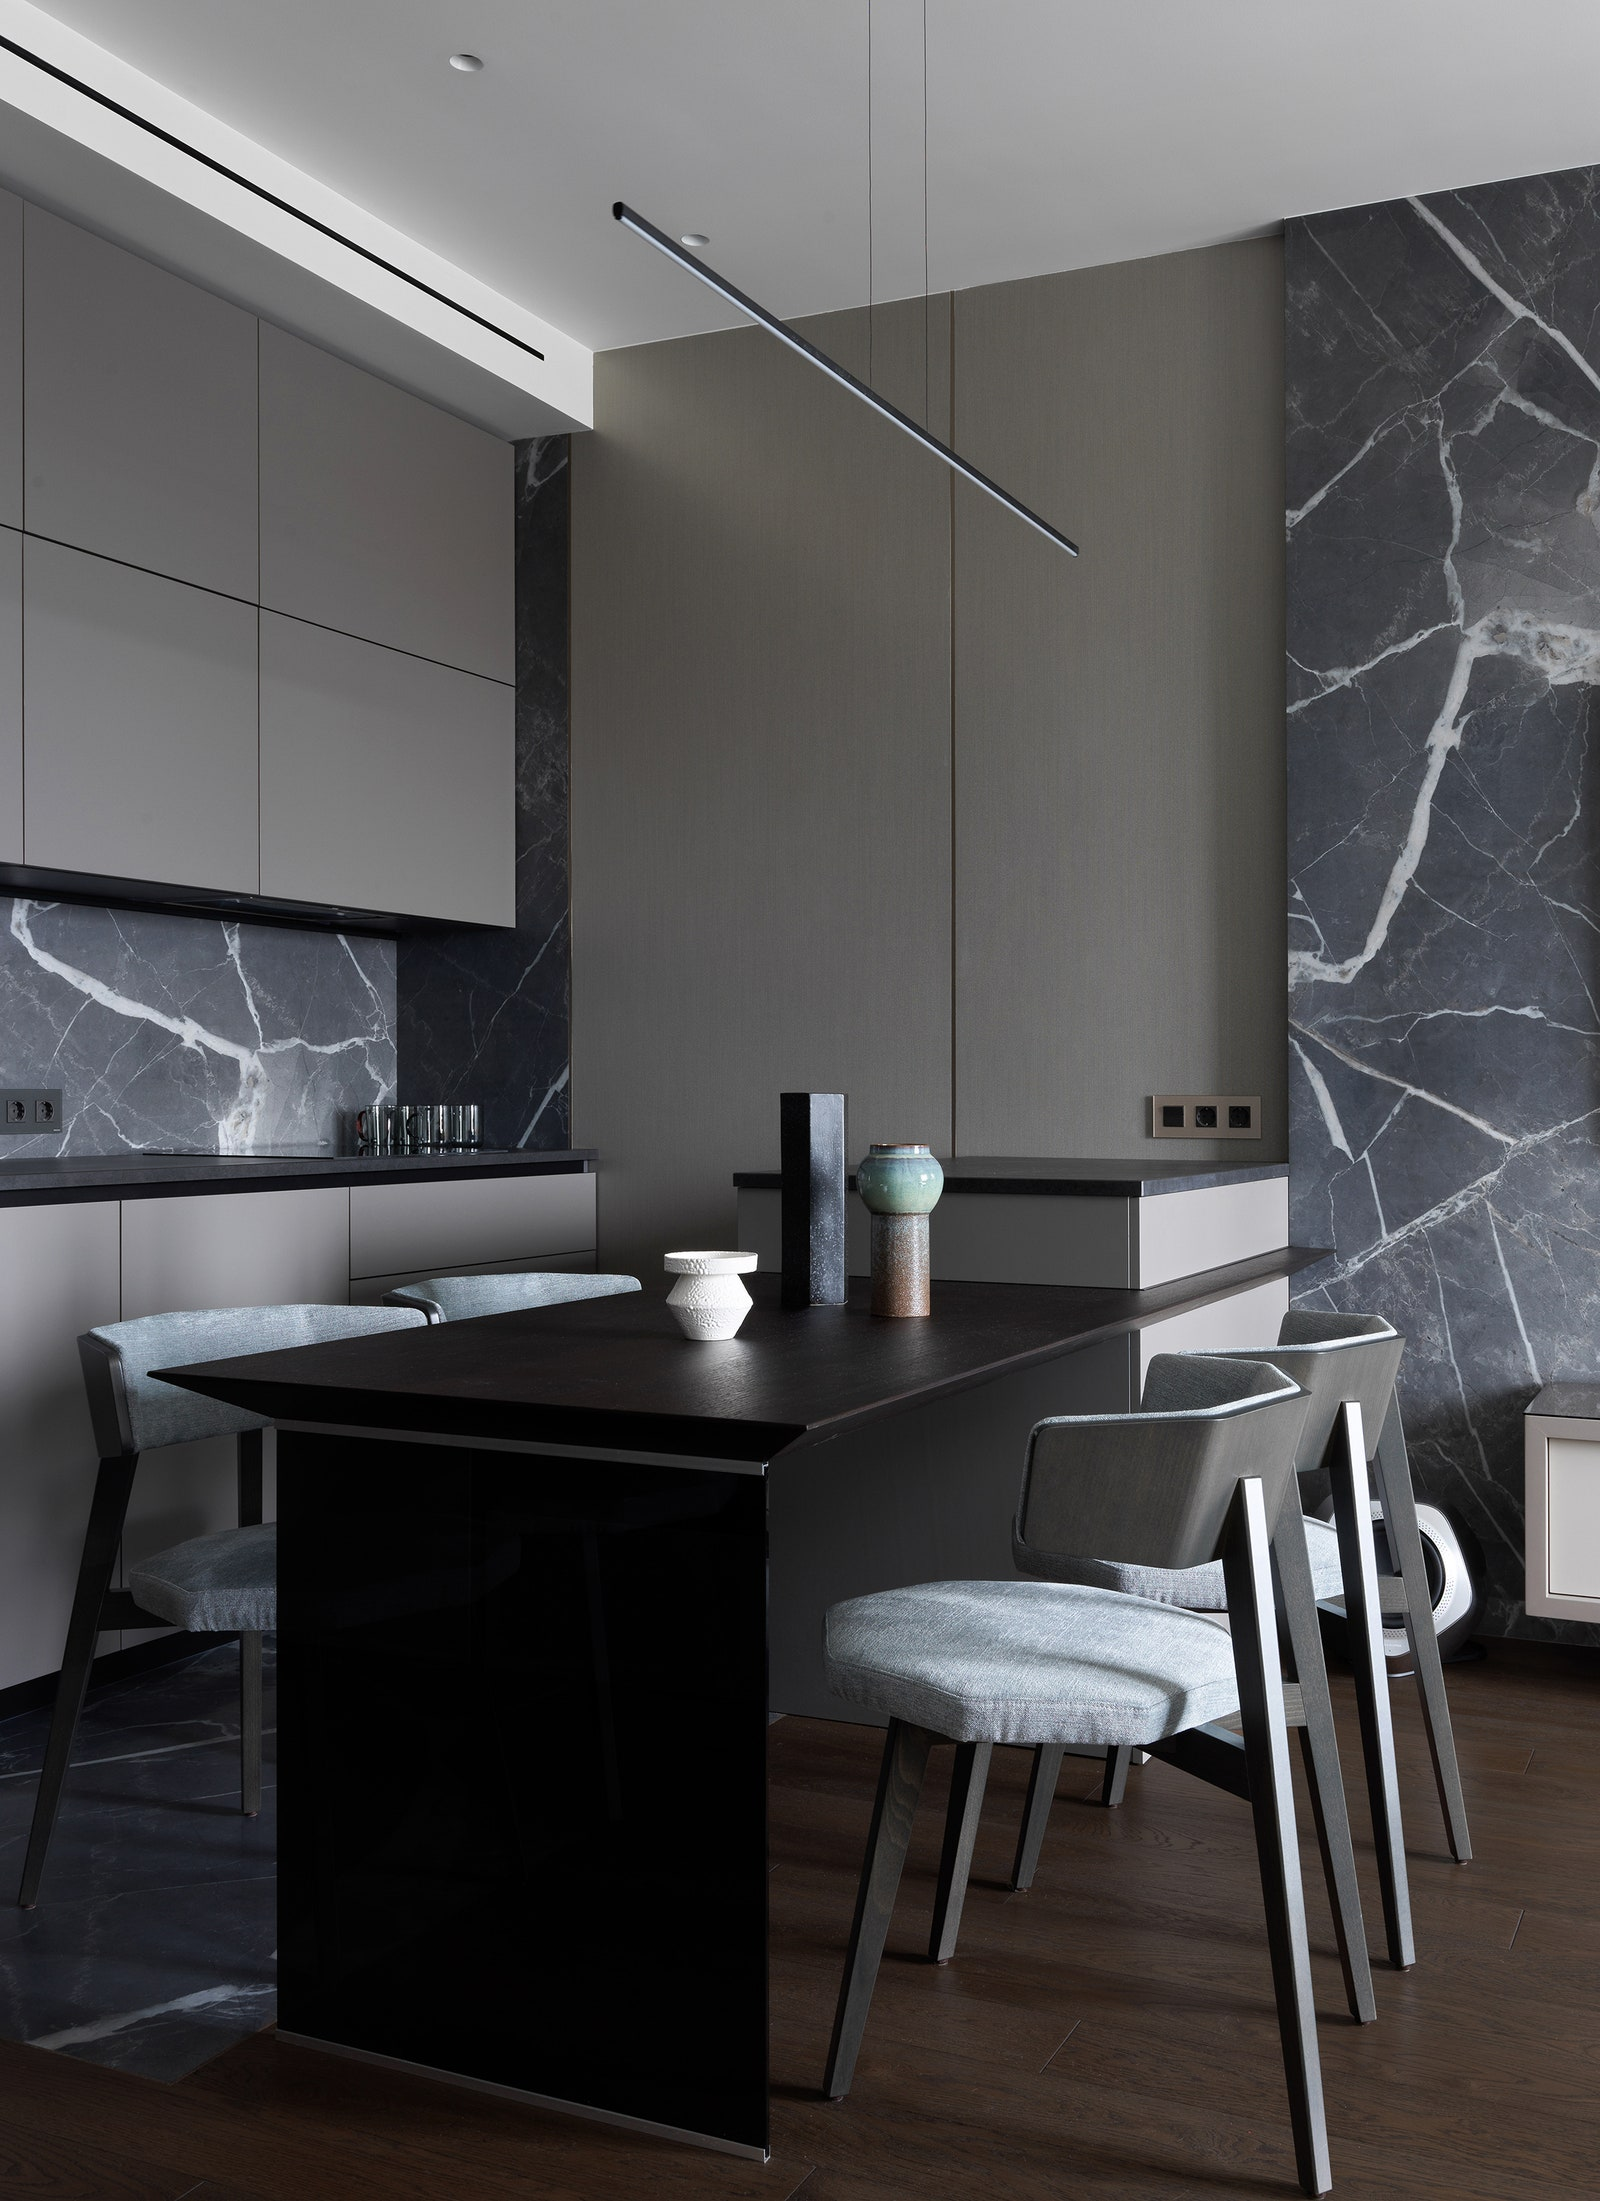 .  Arrital   Potocco        Miele   Linea Light   Schmitz Spot Color  Zara Home  Ceramum     Blanco  Casa Dolce Casa ...